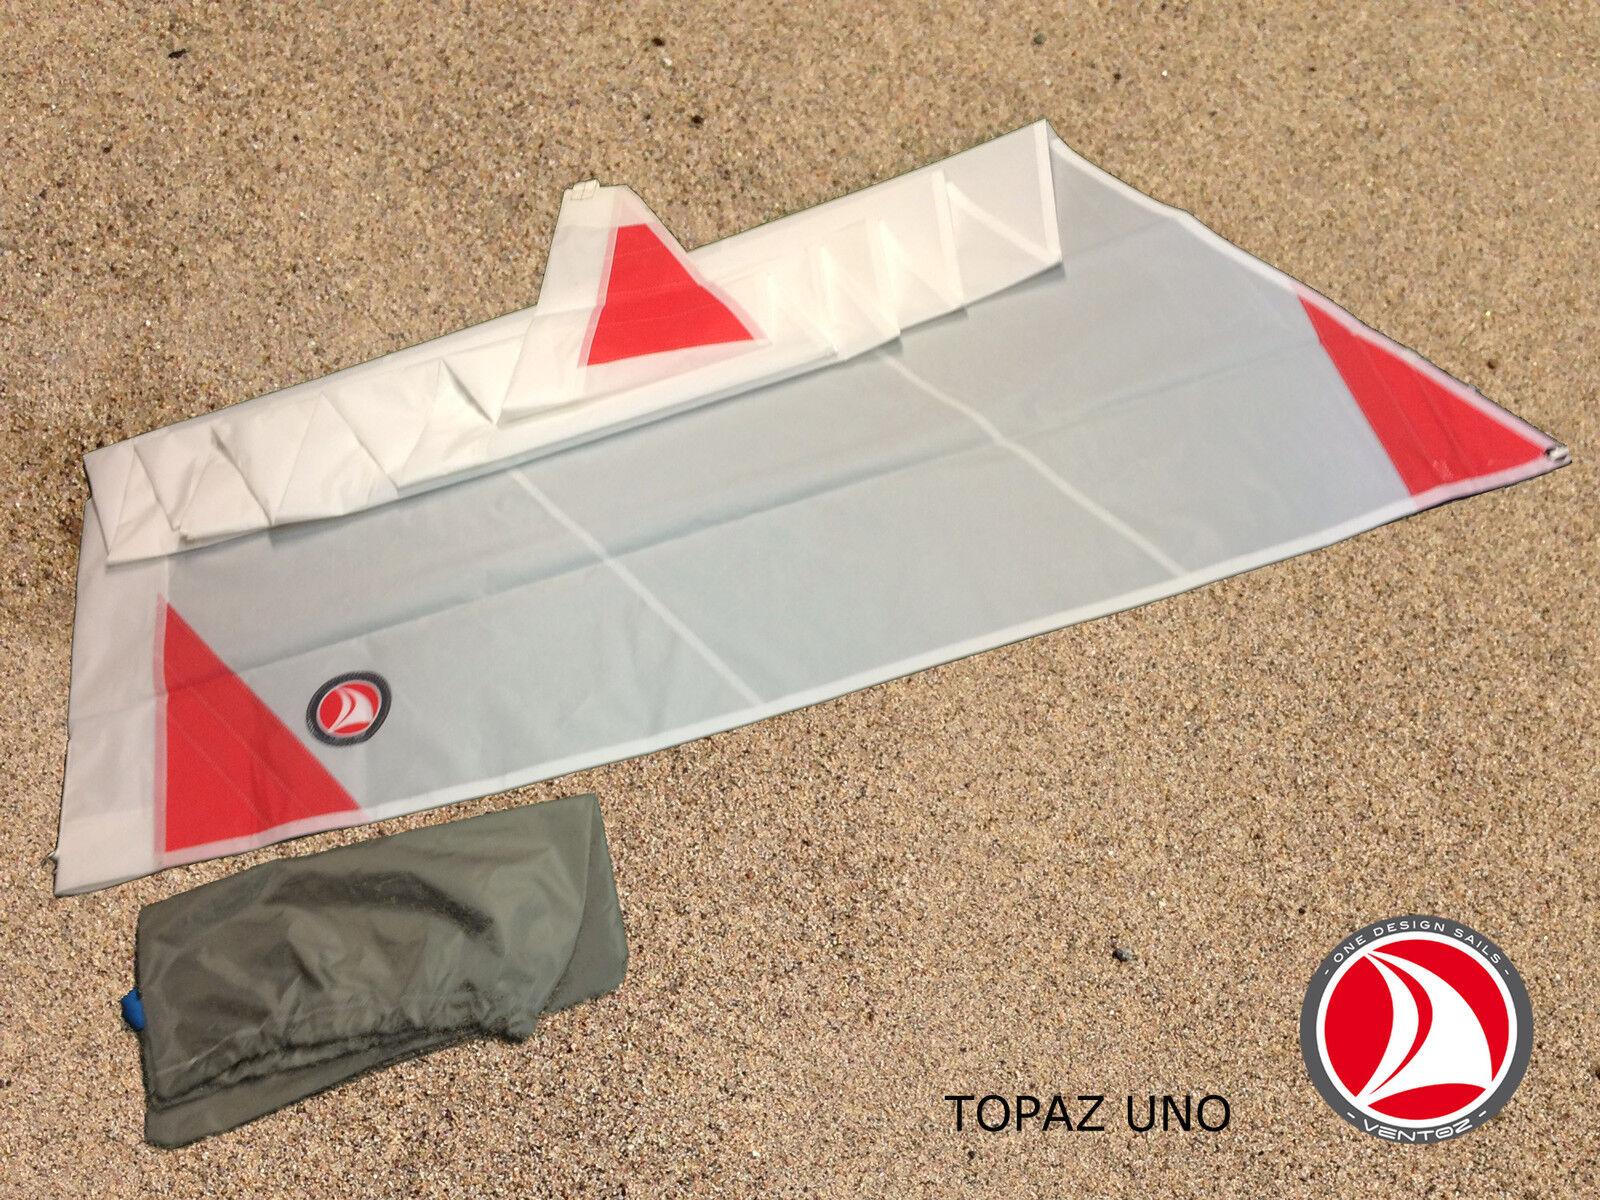 Ventoz Topaz UNO - Großsegel (5.6 m2) m2) m2) fe6017